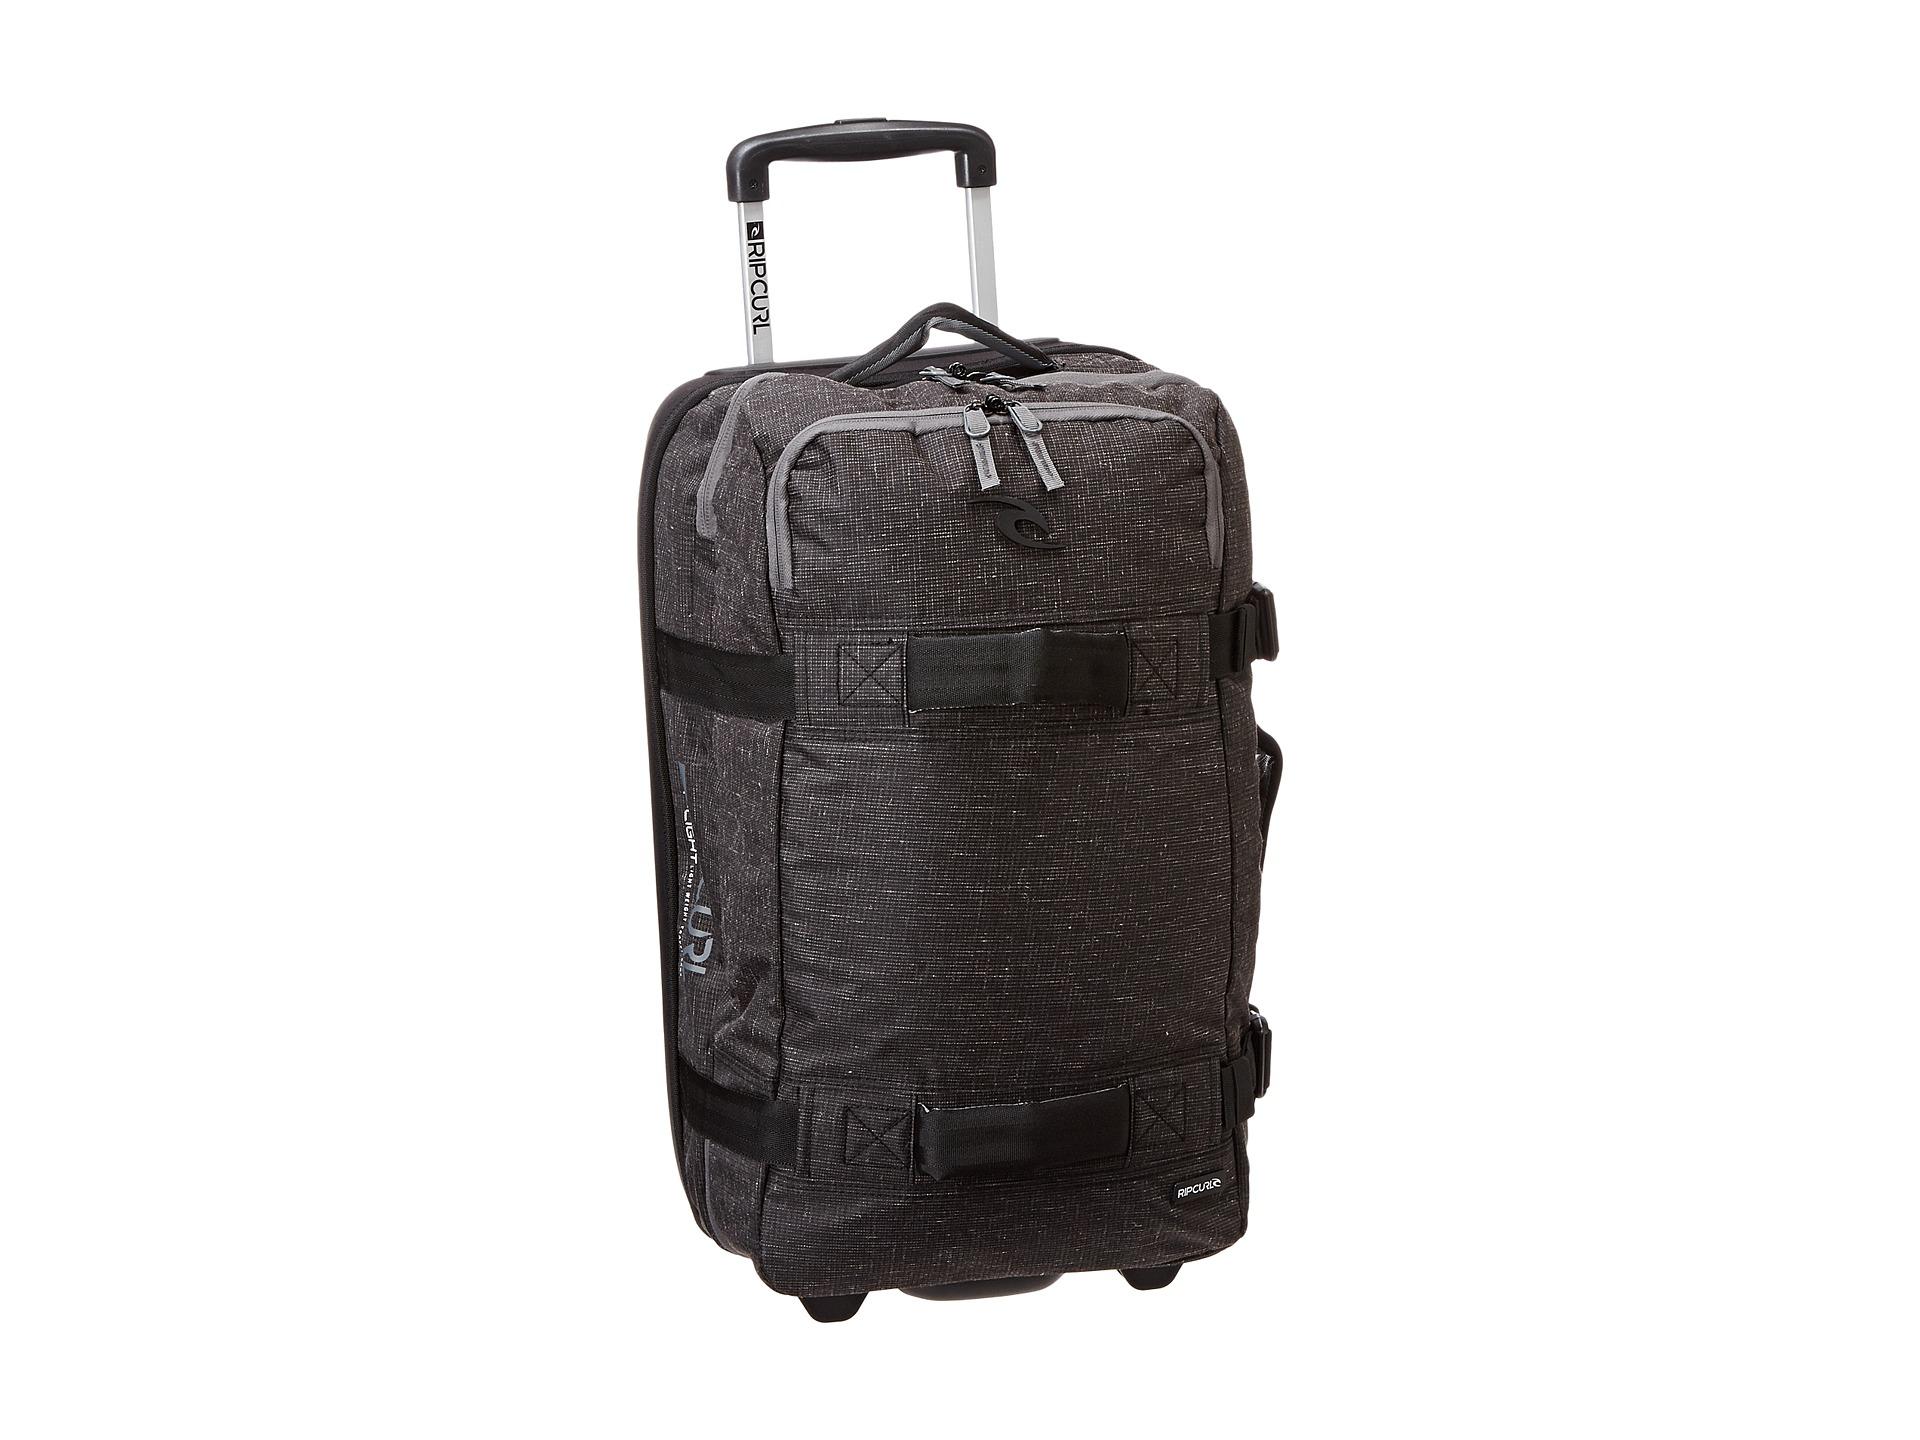 Rip Curl Global F Light Wheely Travel Bag Stealth